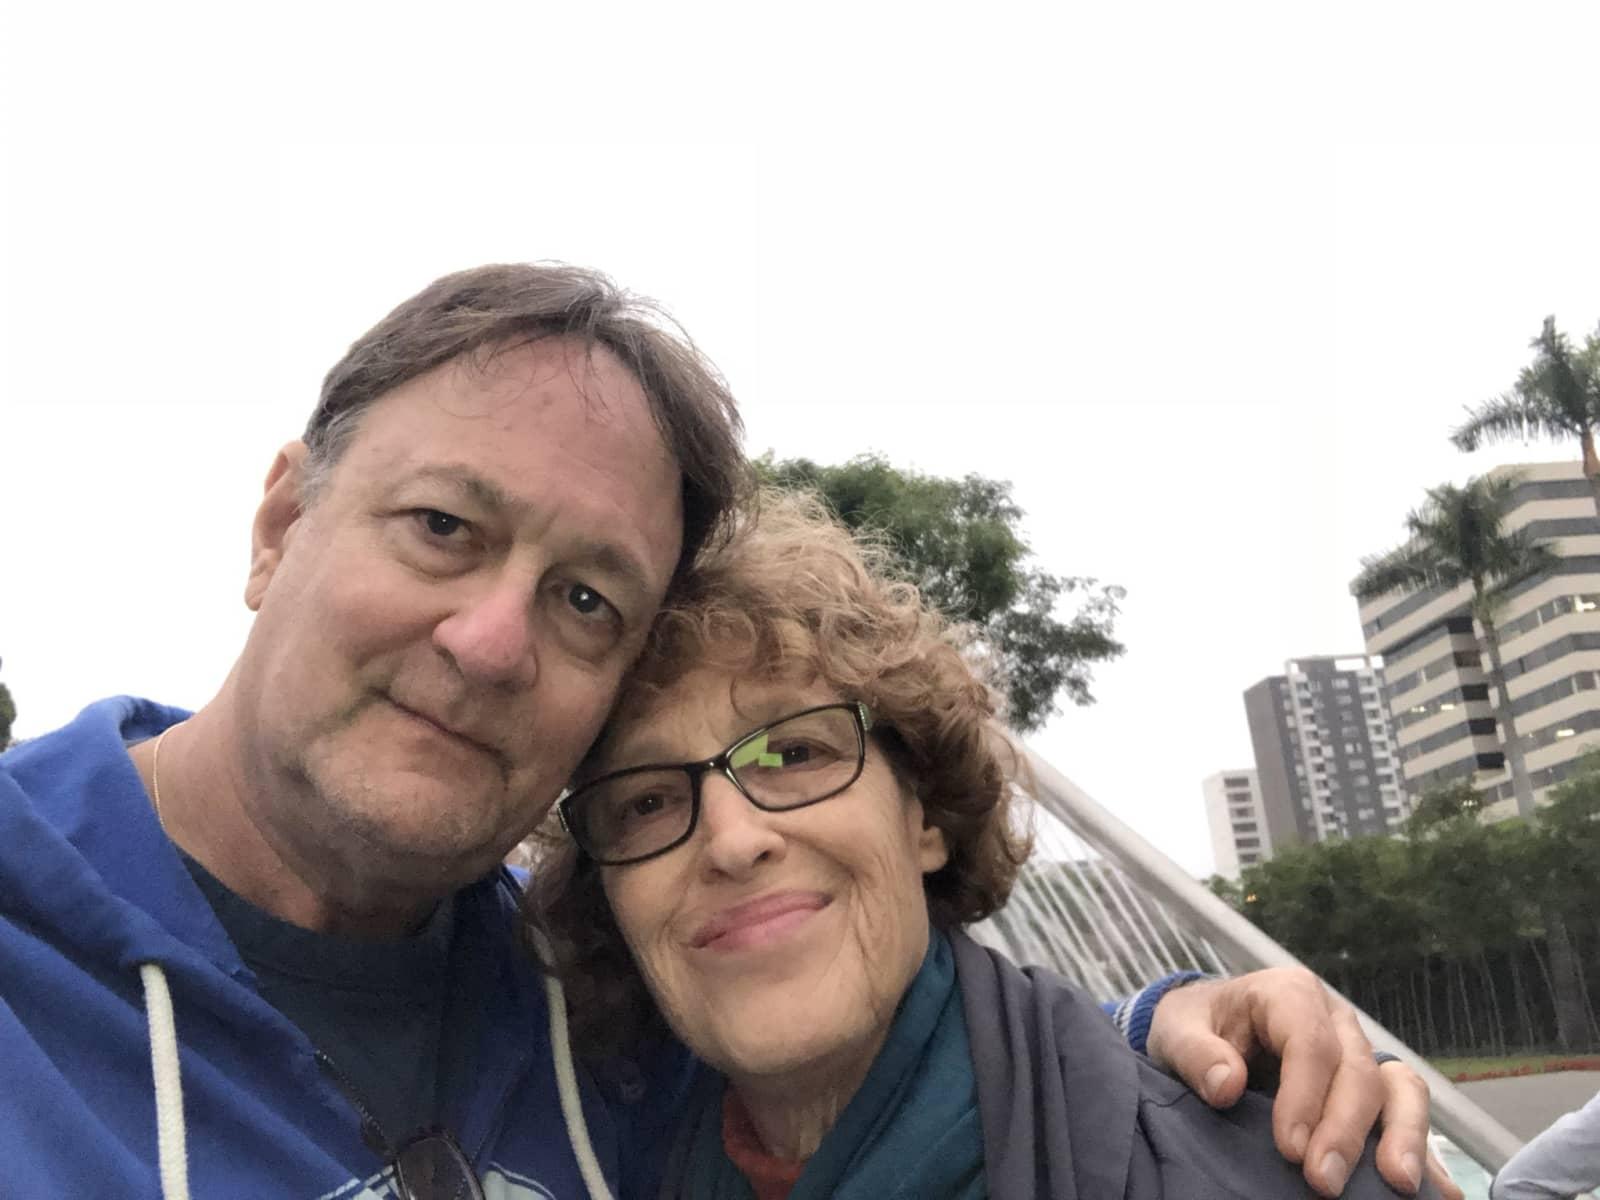 Allen & Kathy from Austin, Texas, United States